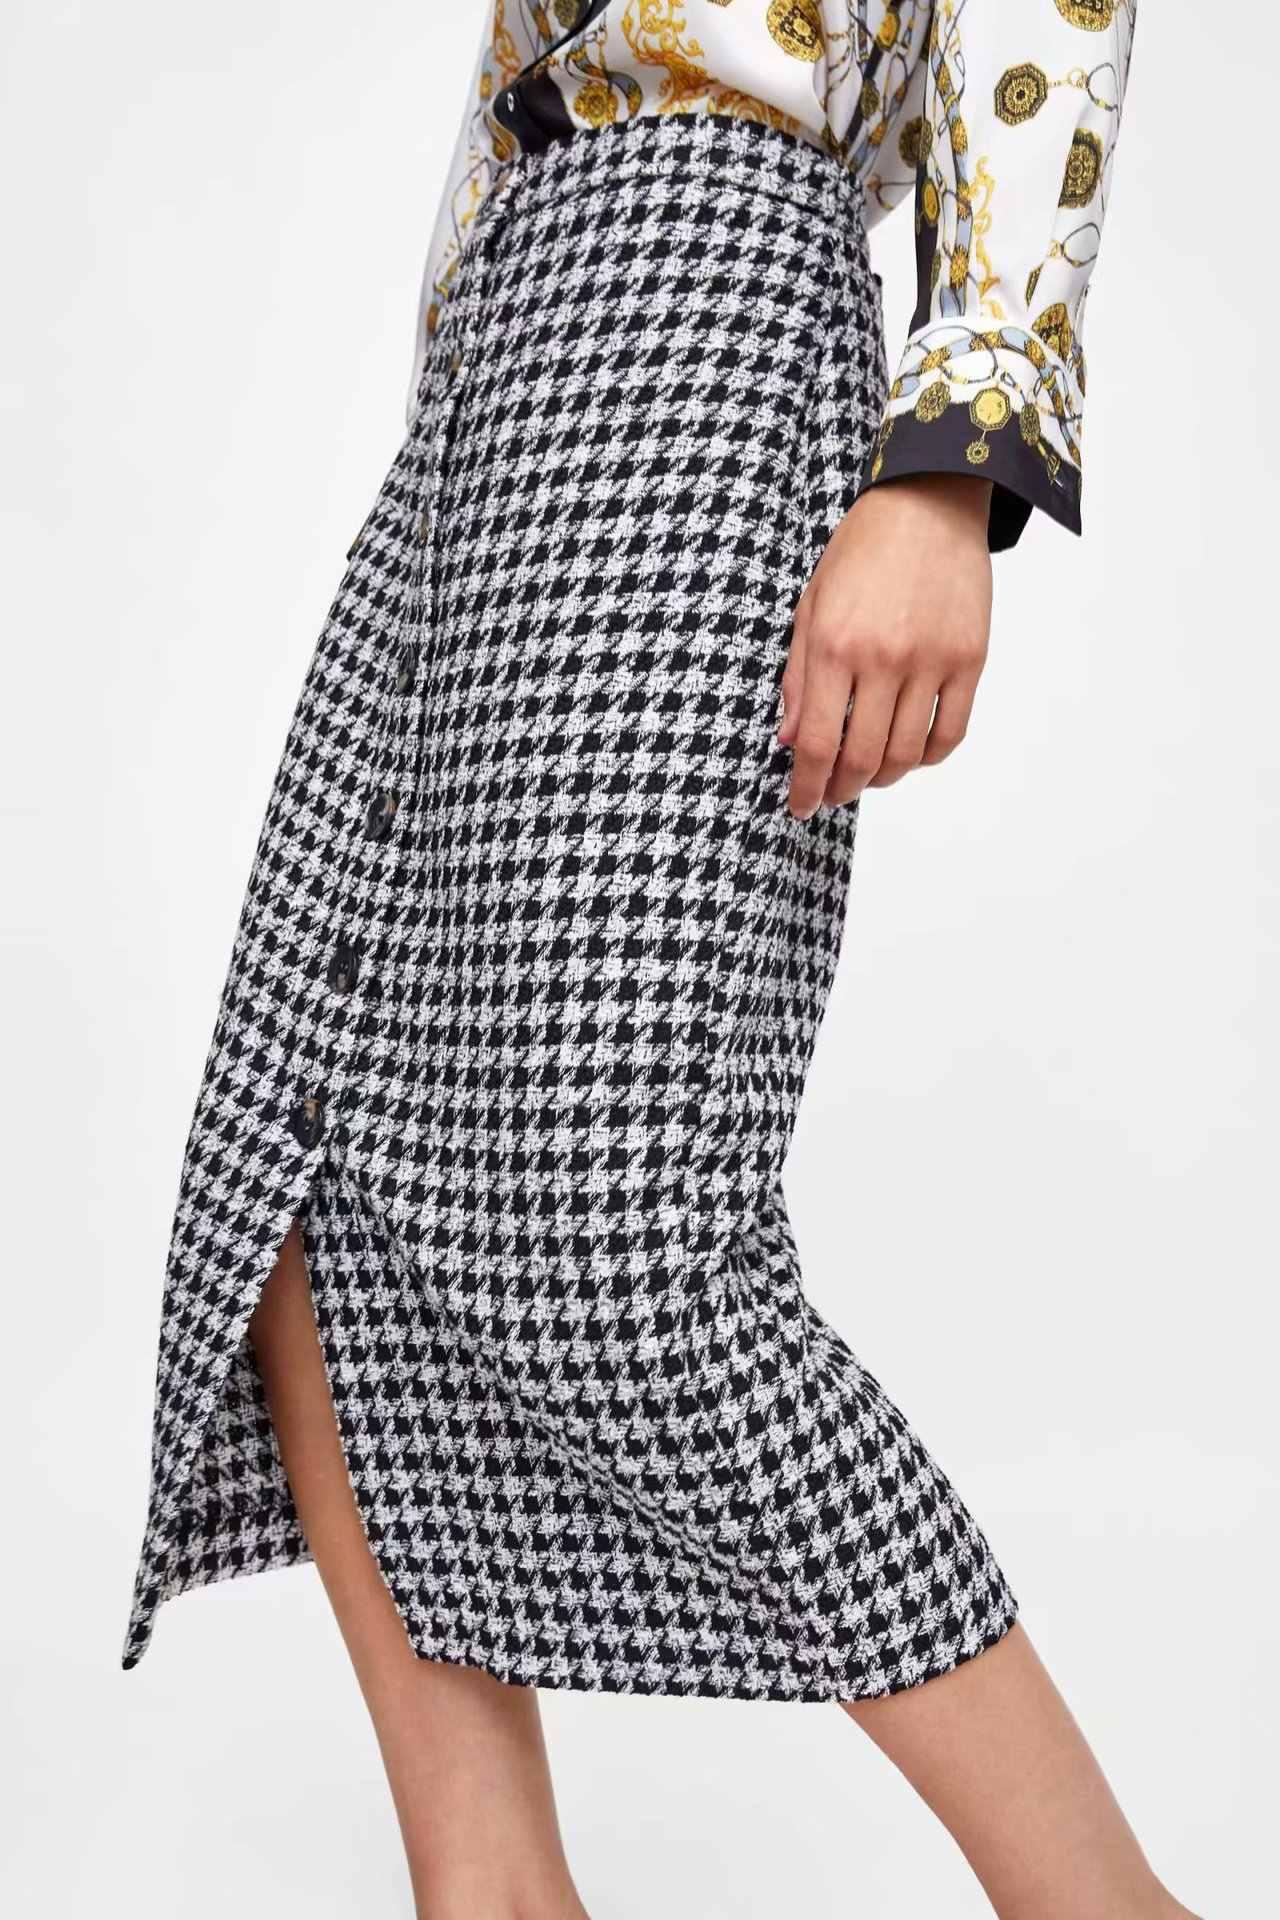 0ac18ee513ac Women Wool Blends Houndstooth Button Through Midi Straight Skirt 2018 New  Arrivals